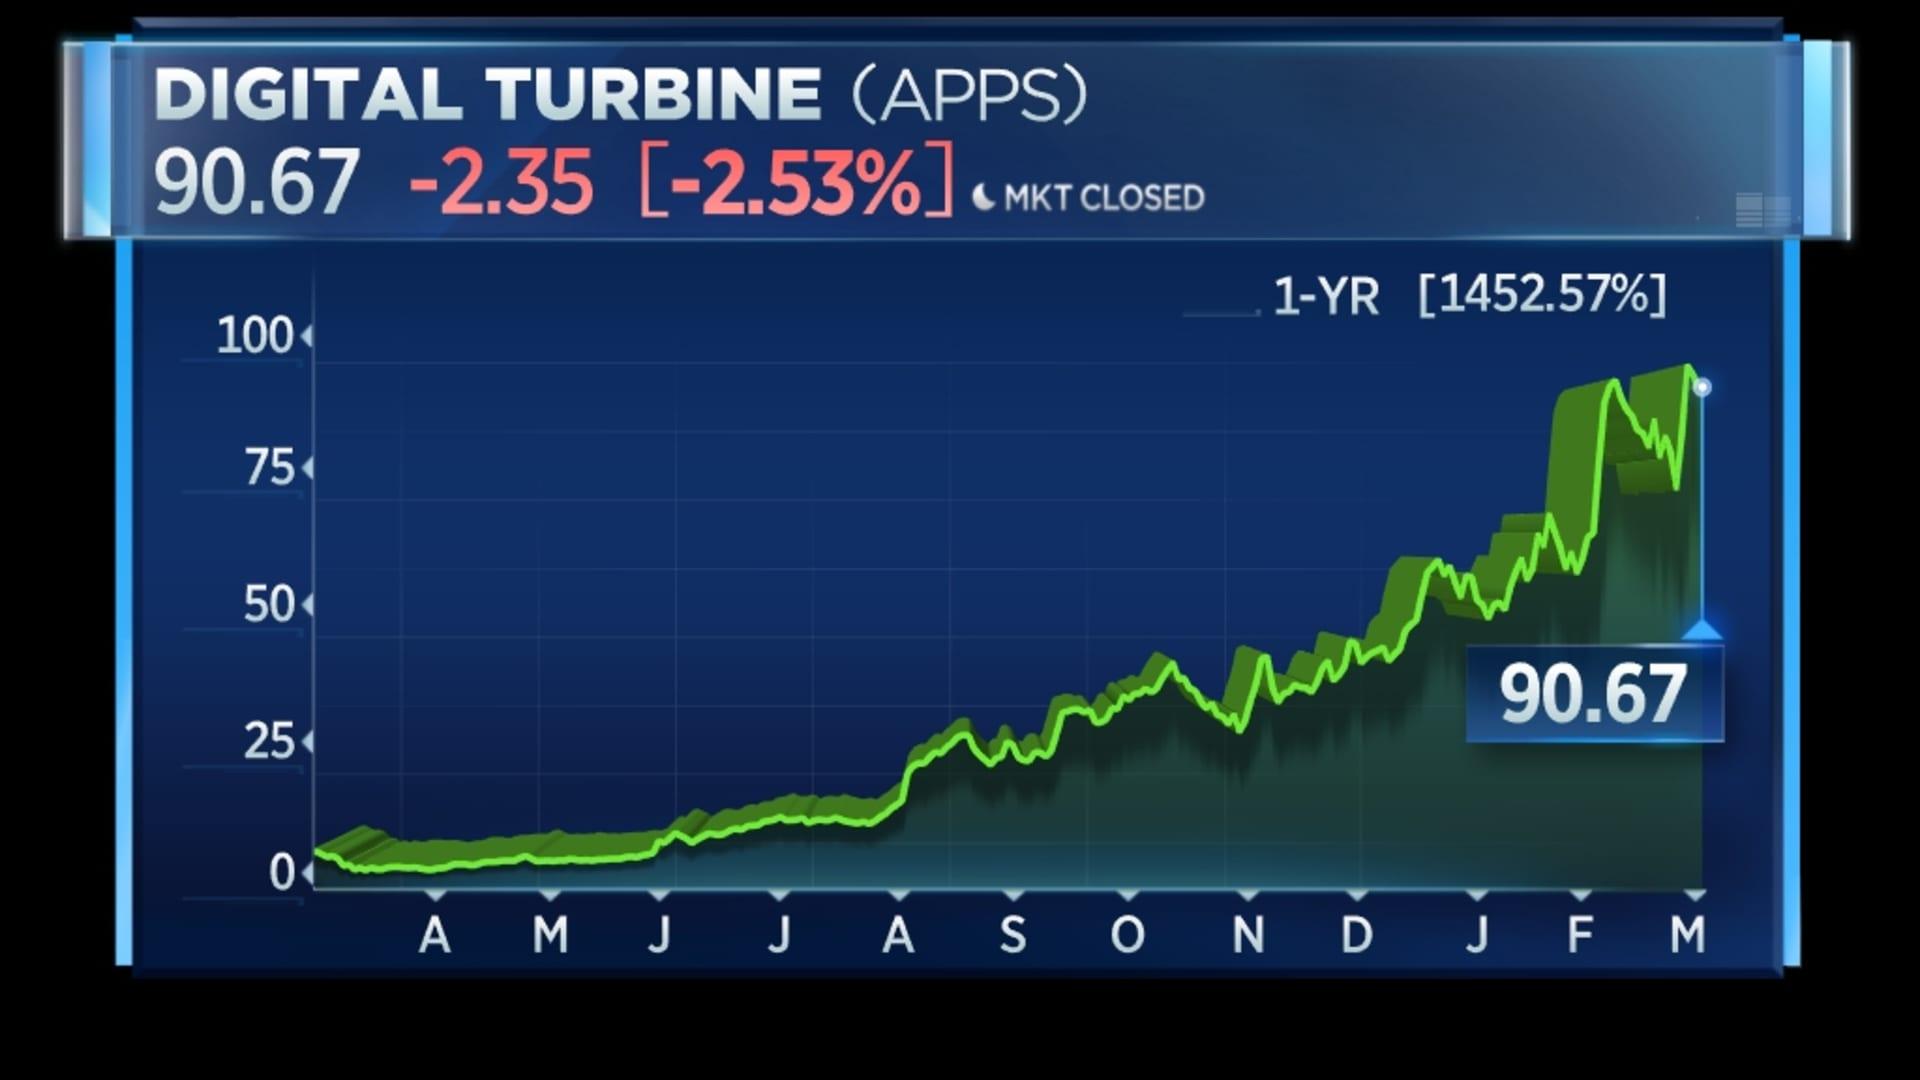 Digital Turbine 12-month rally